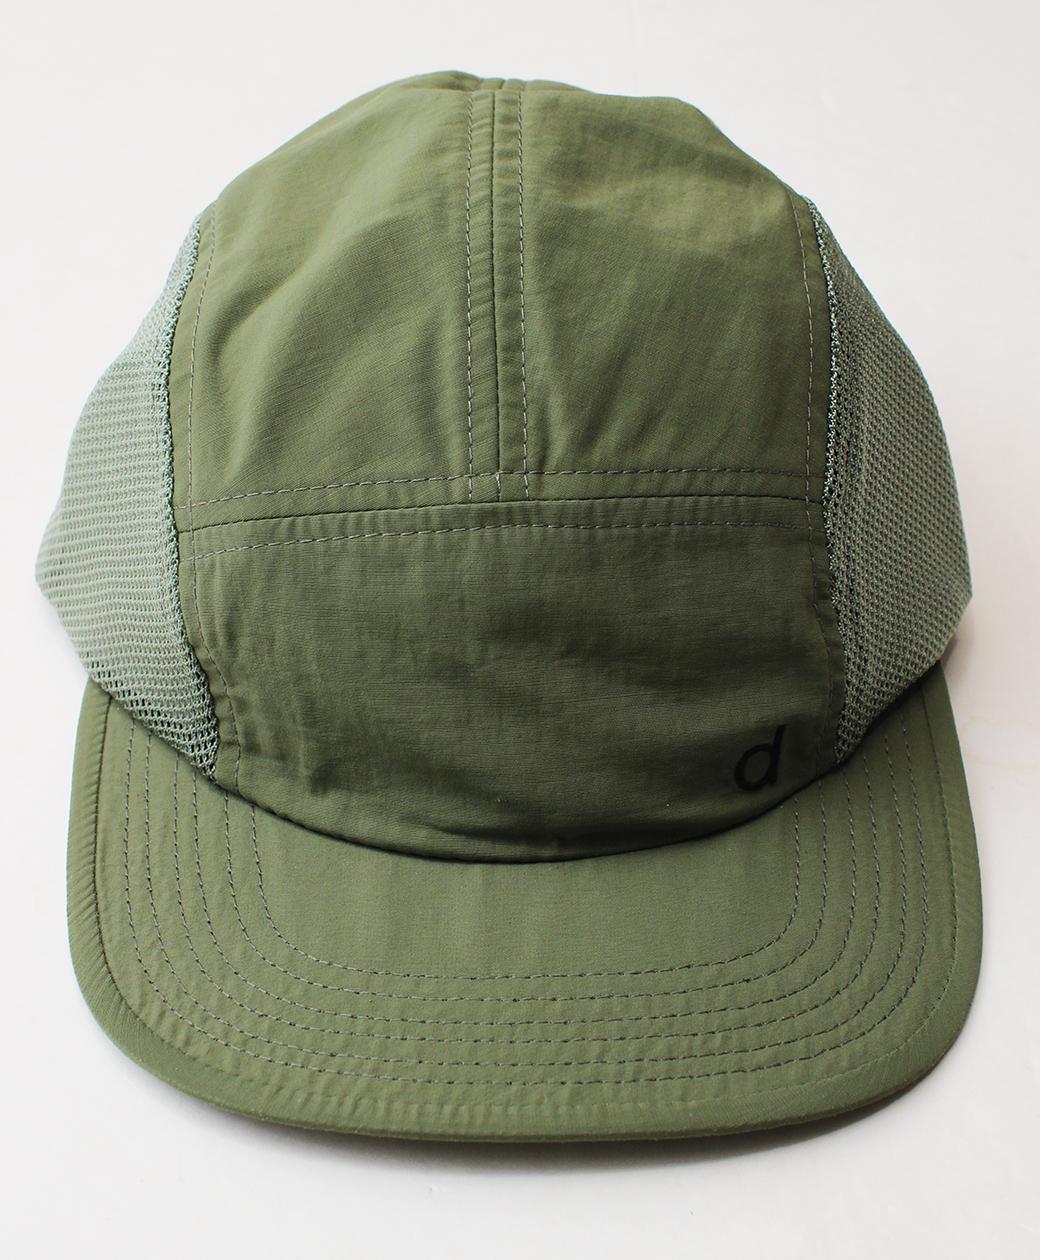 DESCENTE JET CAP(OLV)